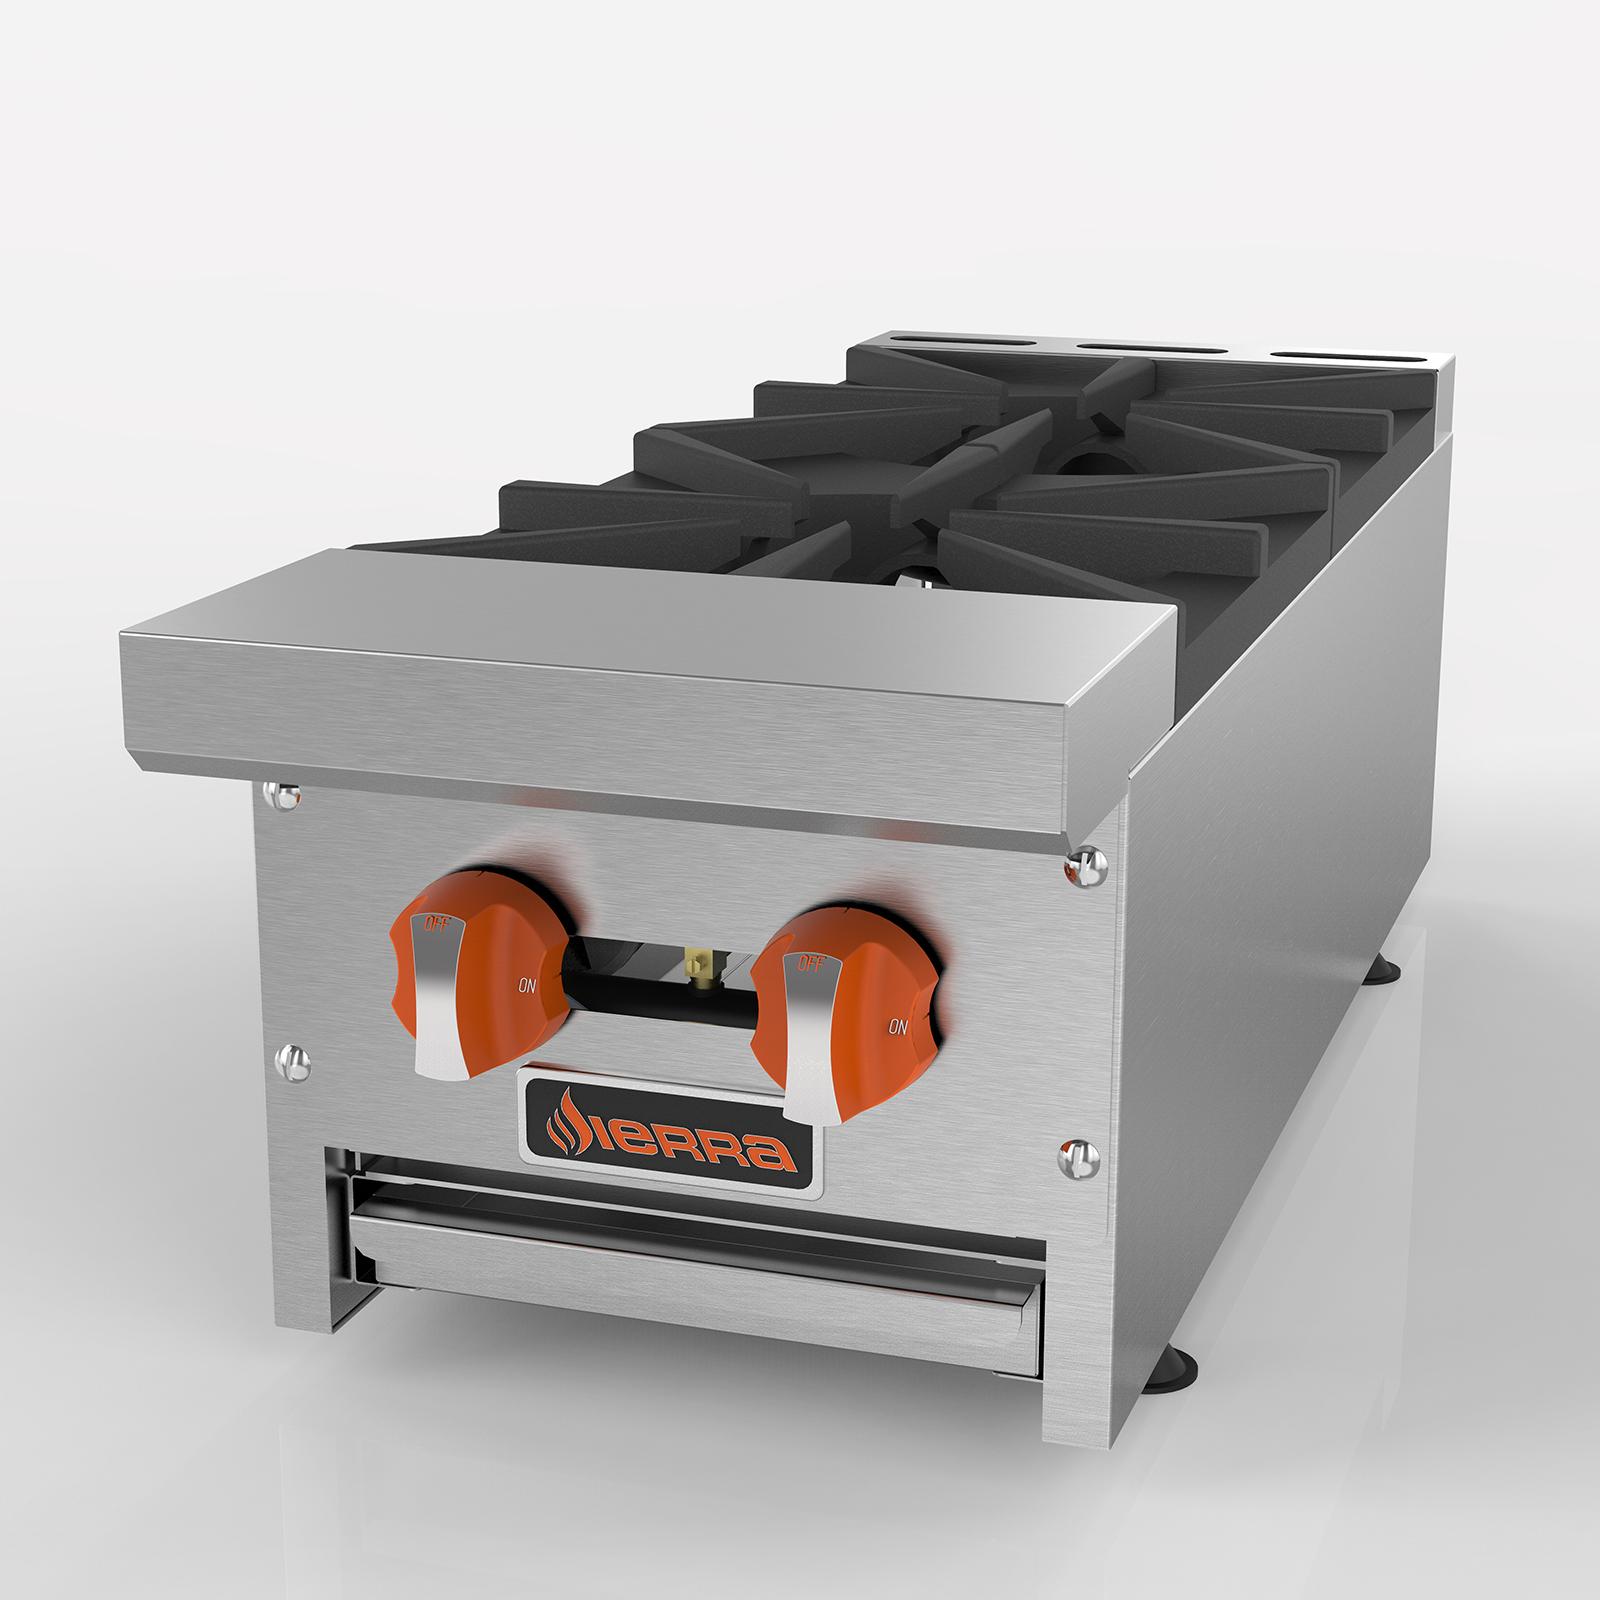 MVP SRHP-2-12 hotplate, countertop, gas